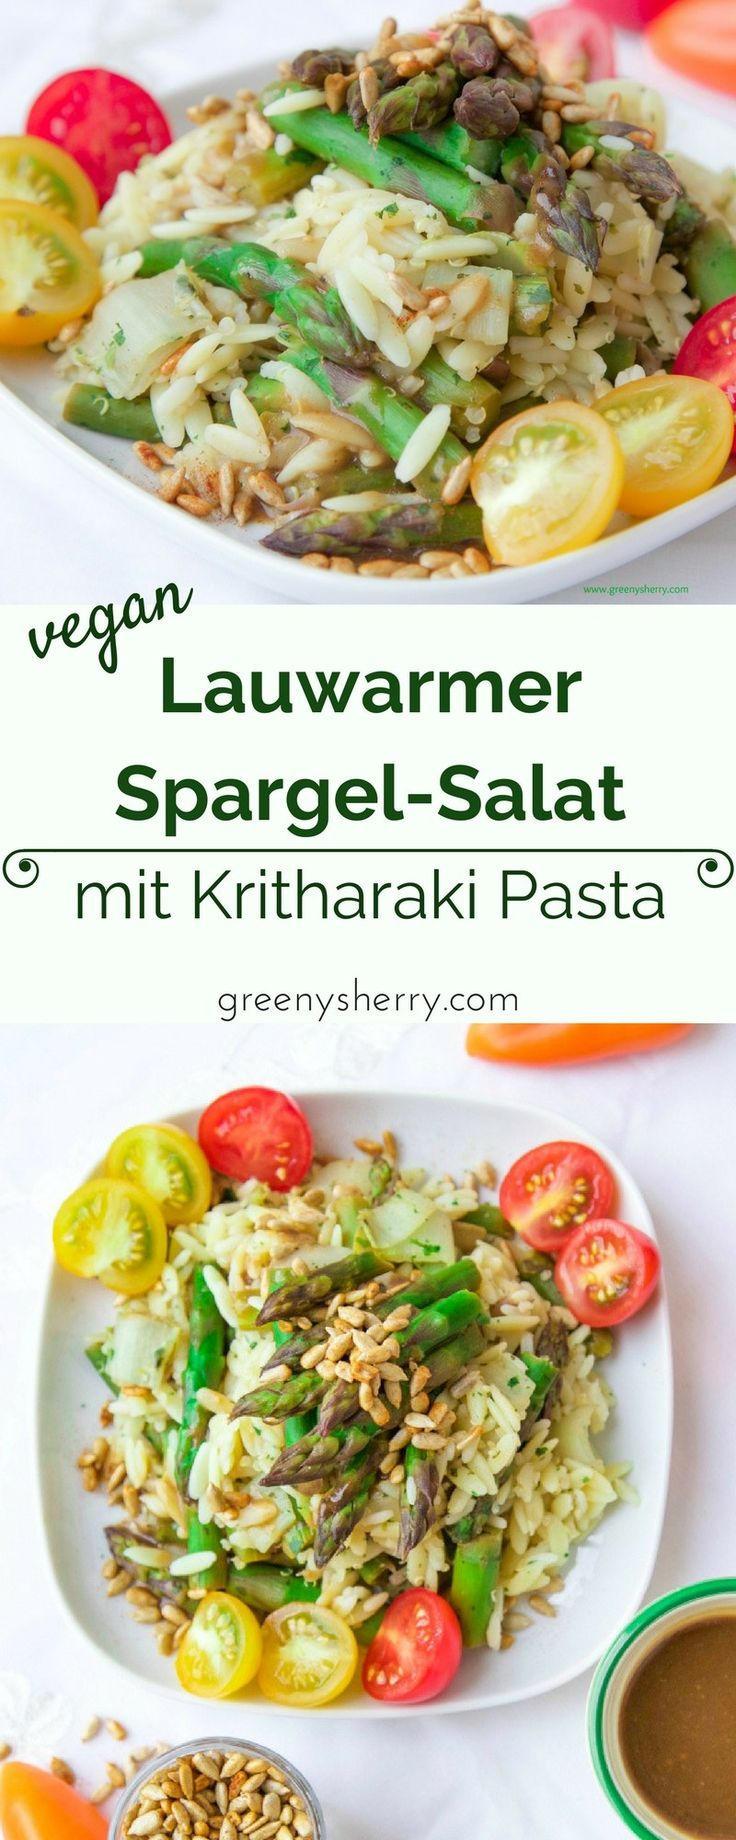 Grüner Spargel-Salat mit Kritharaki-Nudeln, Chicorée und gerösteten Sonnenblumenkernen - www.greenysherry.com - #saisonal #regional #vegan #vegetarisch #gemüse #spargel #grün #eatyourgreens #frühling #mai #salat #lecker #rezept #foodblog #diy #nachhaltig #essen #gesund